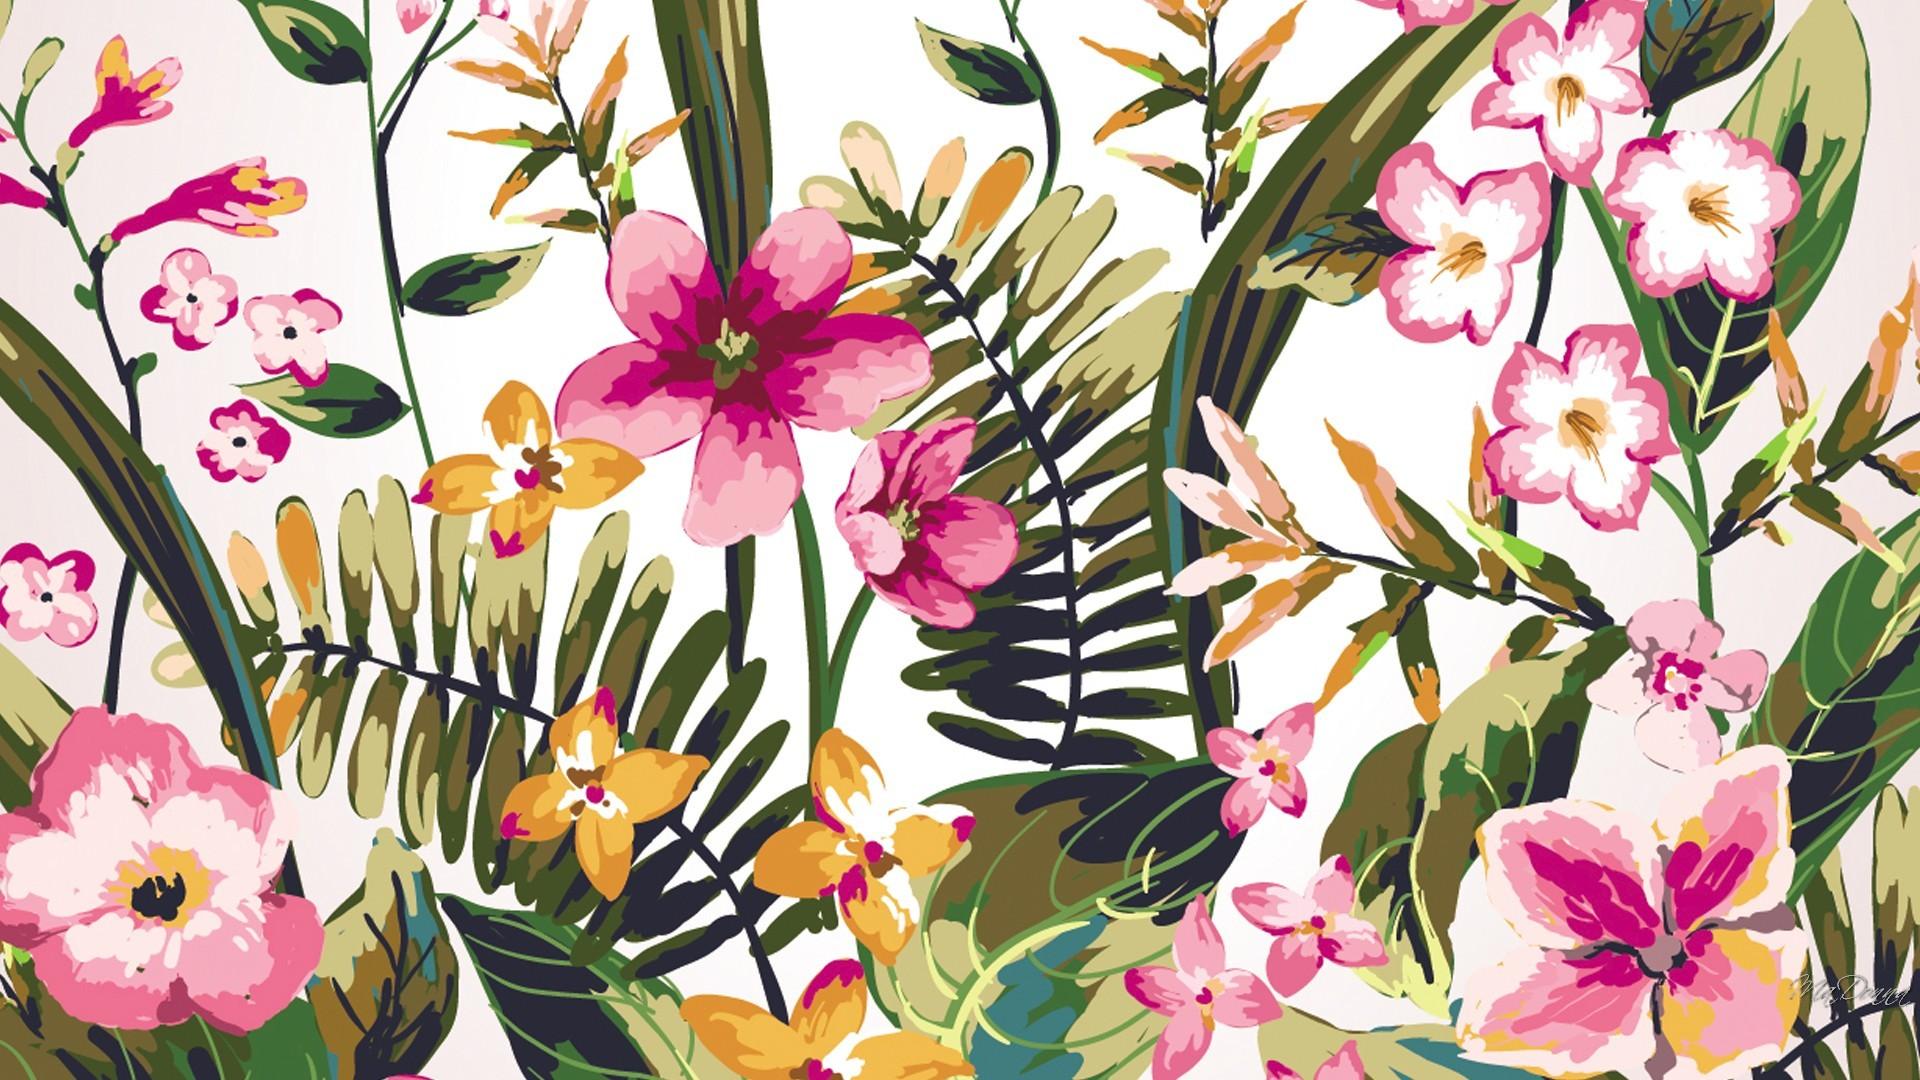 Watercolor Garden HD Desktop Background wallpaper free